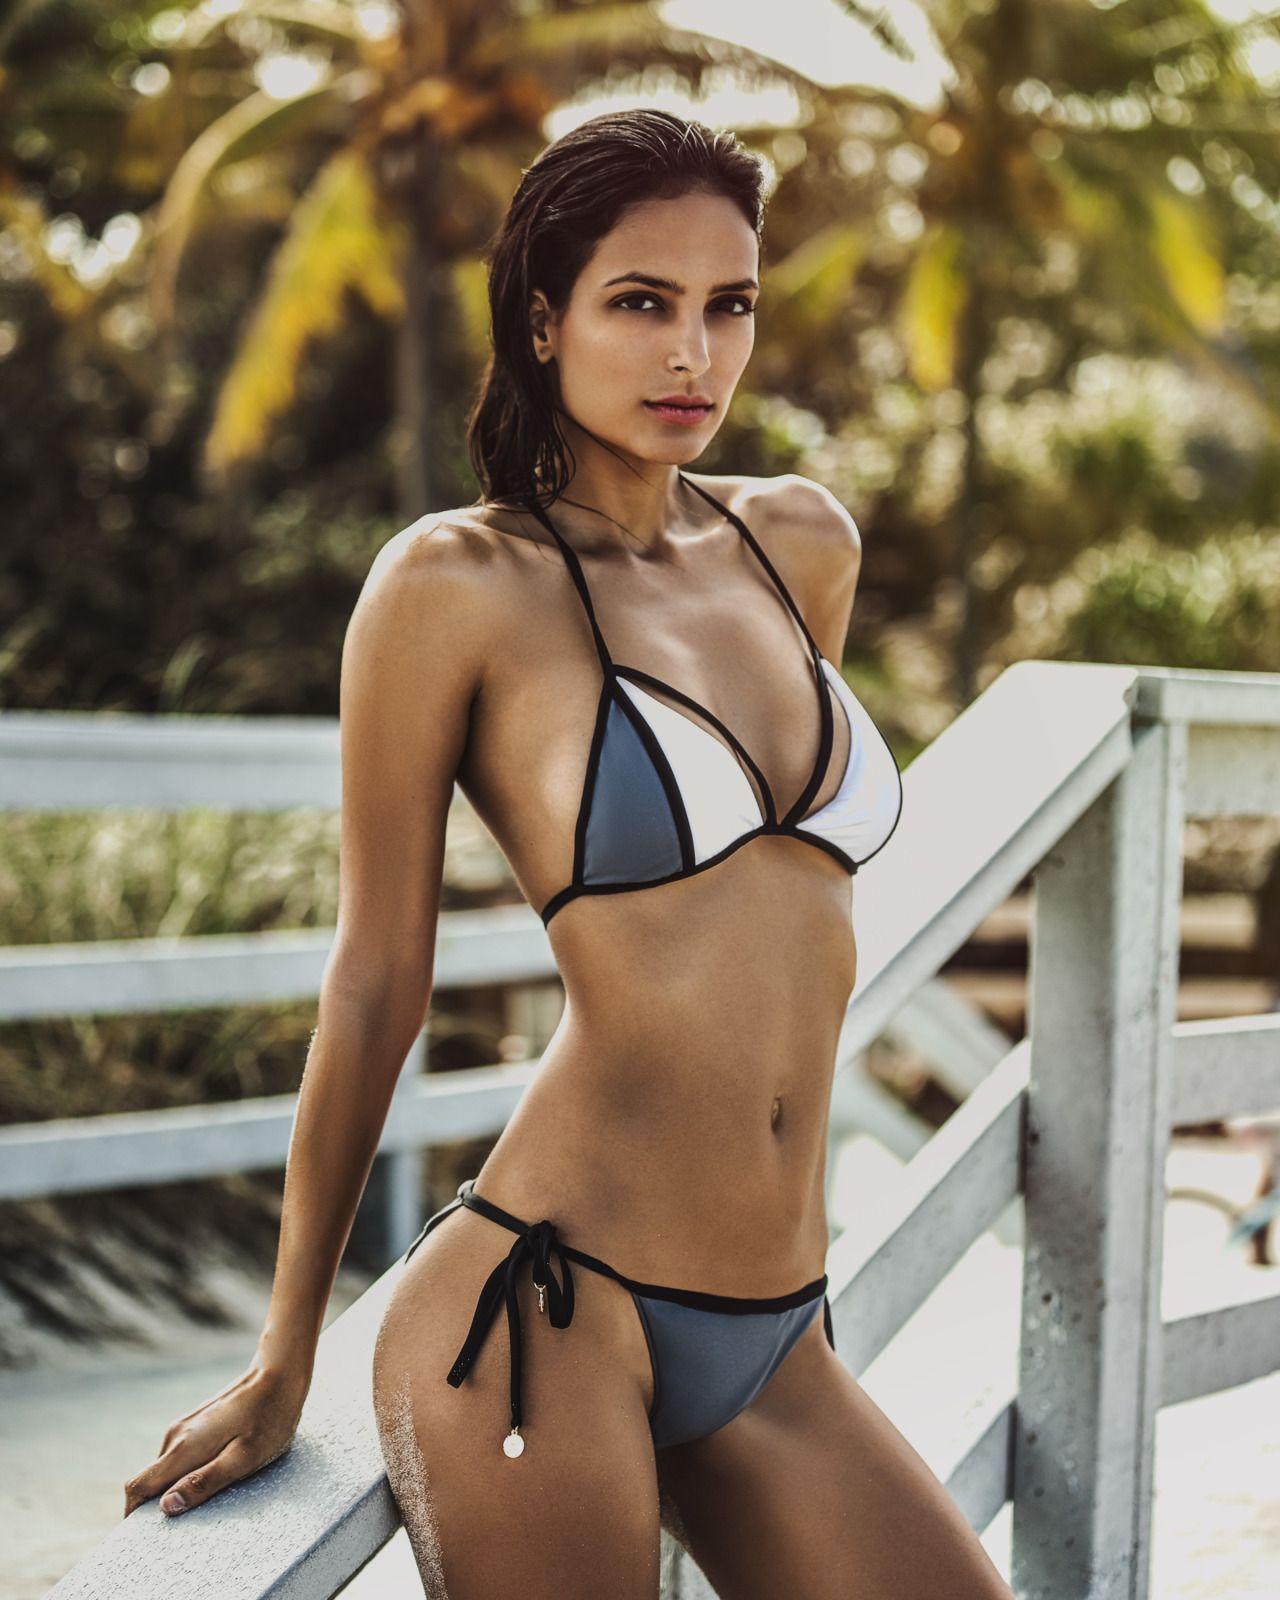 d00b43a1699c6 Charming Bikini Girls. Daily Pics. Sunny Beaches   Stylish Swimwear.